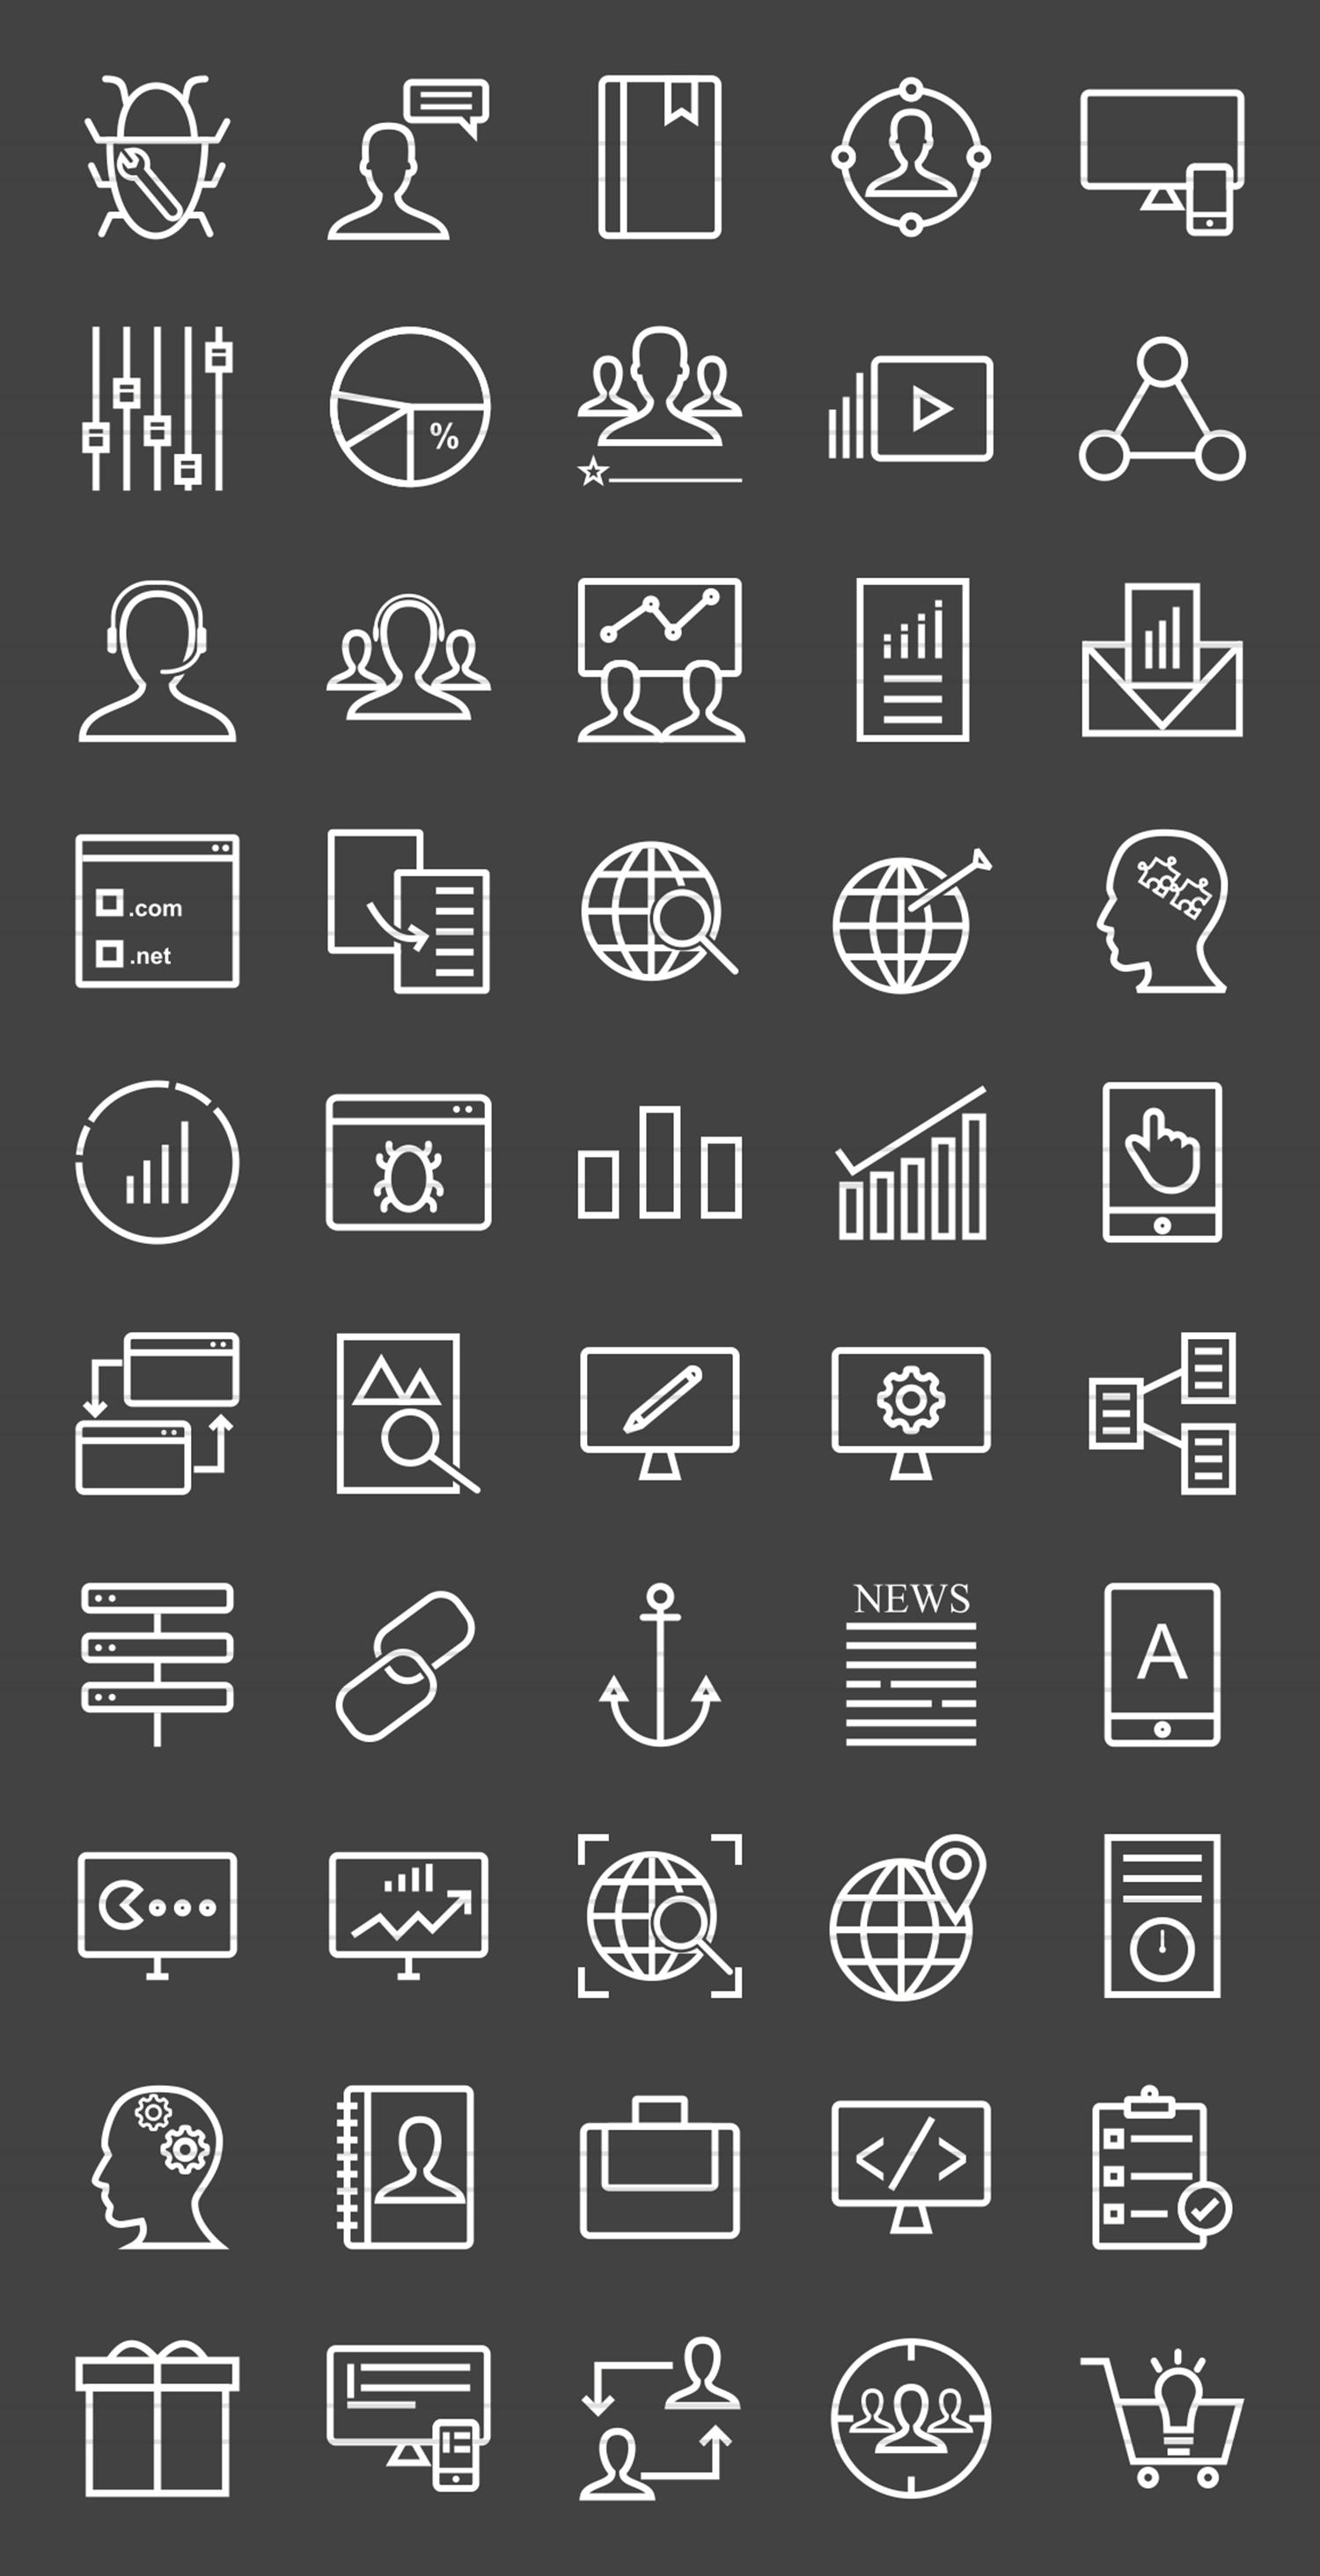 50 SEO & Development Line Inverted Icons example image 2